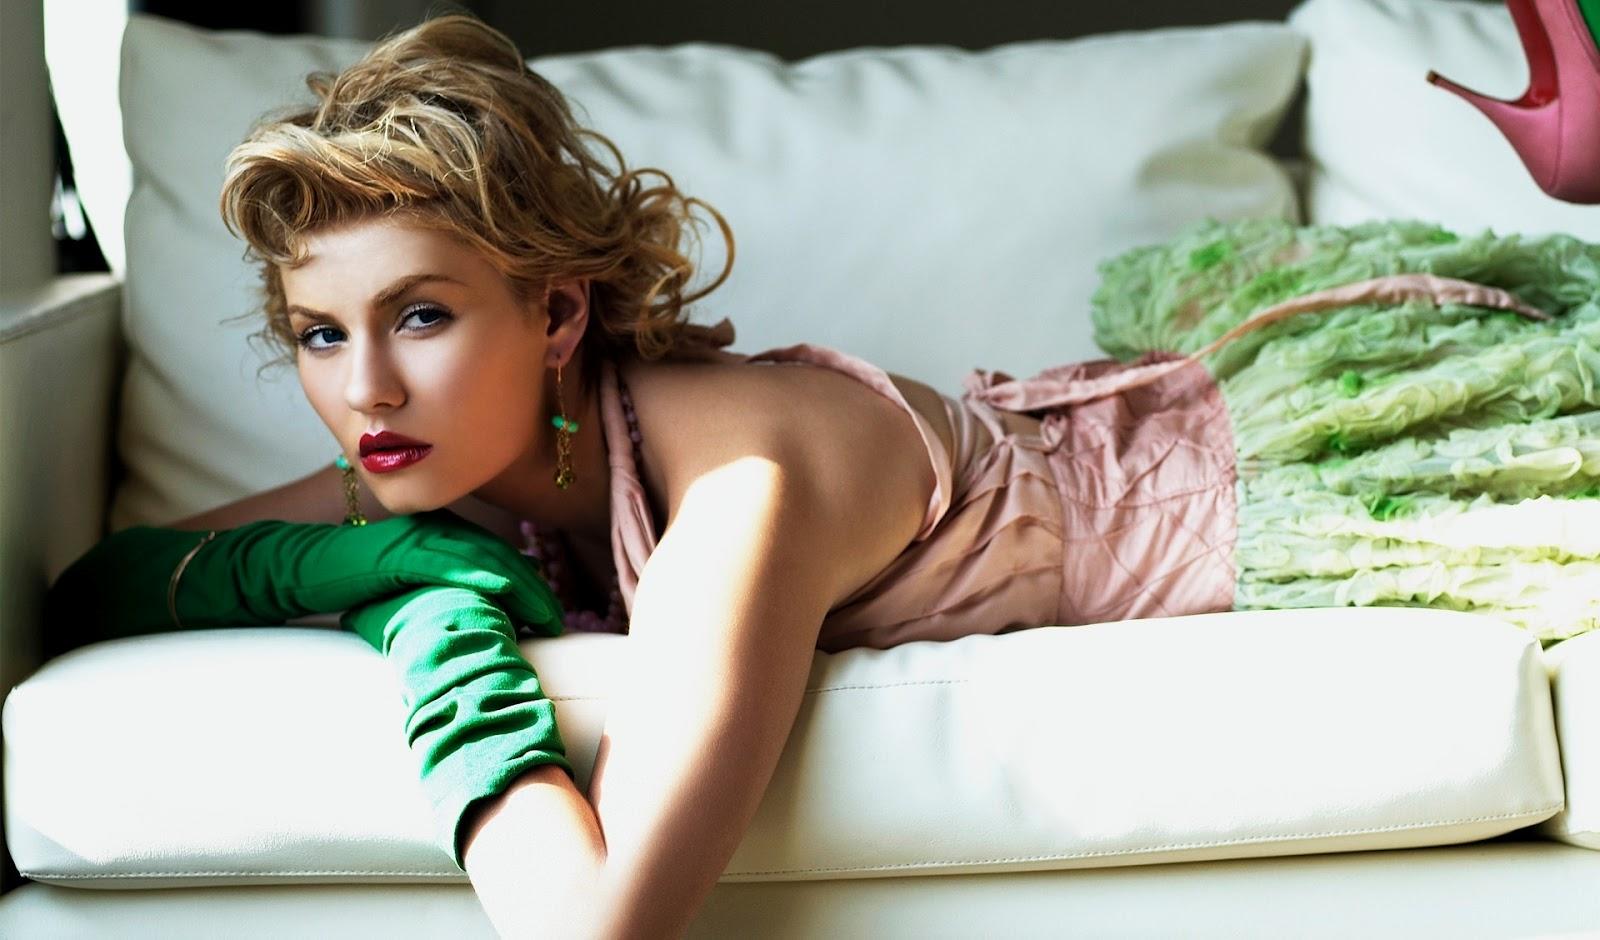 Sexy Elisha Cuthbert Full HD Wallpapers 1080p Top Pix 1600x940